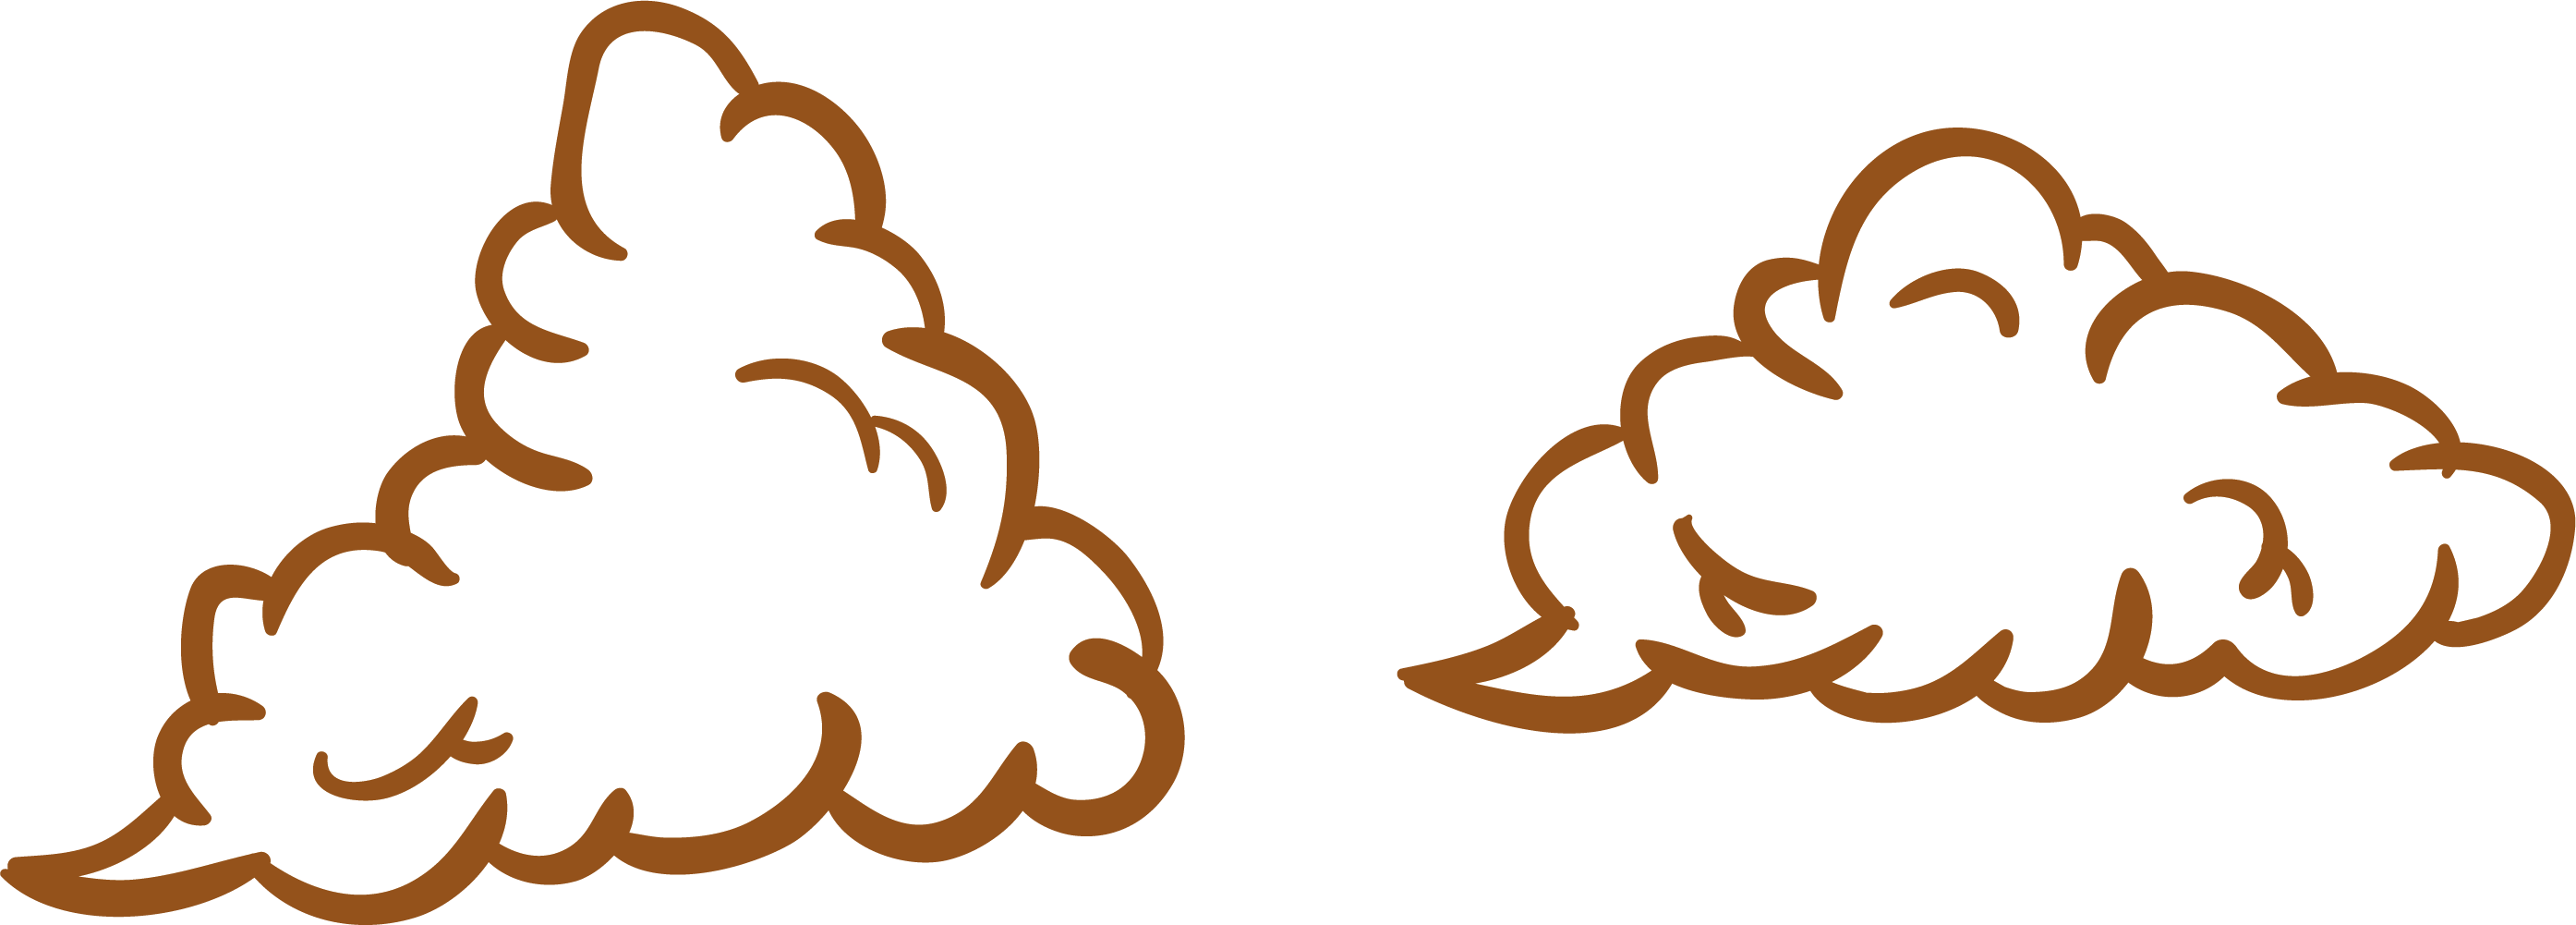 Fog clipart vector. Cloud dust clip art